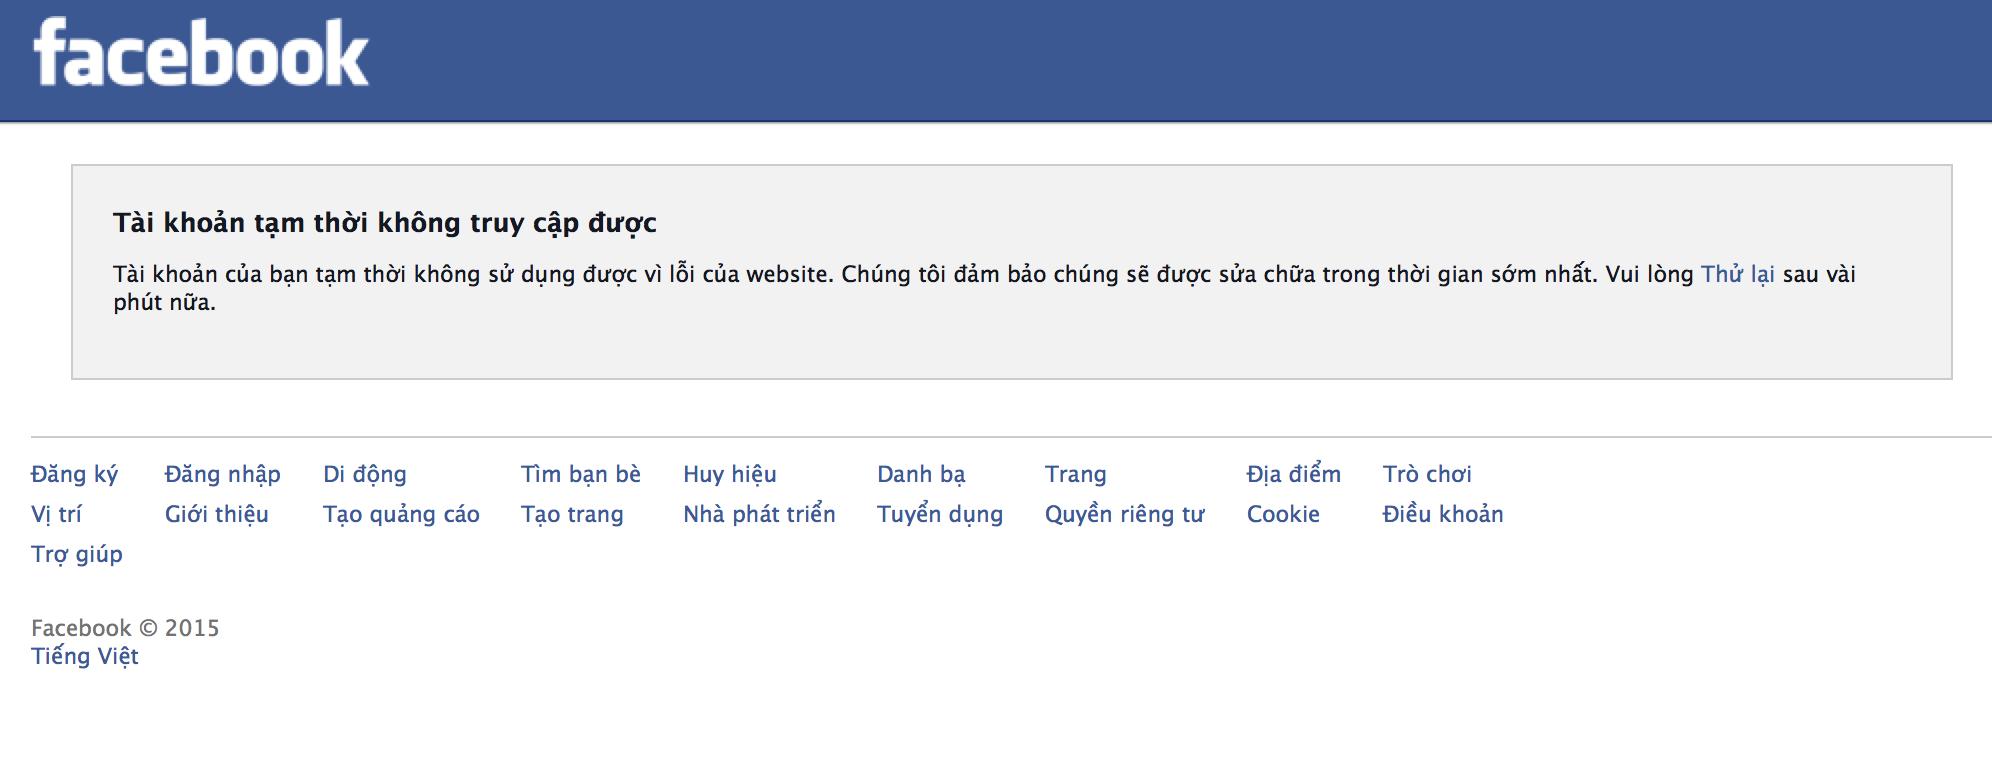 khong-vao-duoc-facebook-1